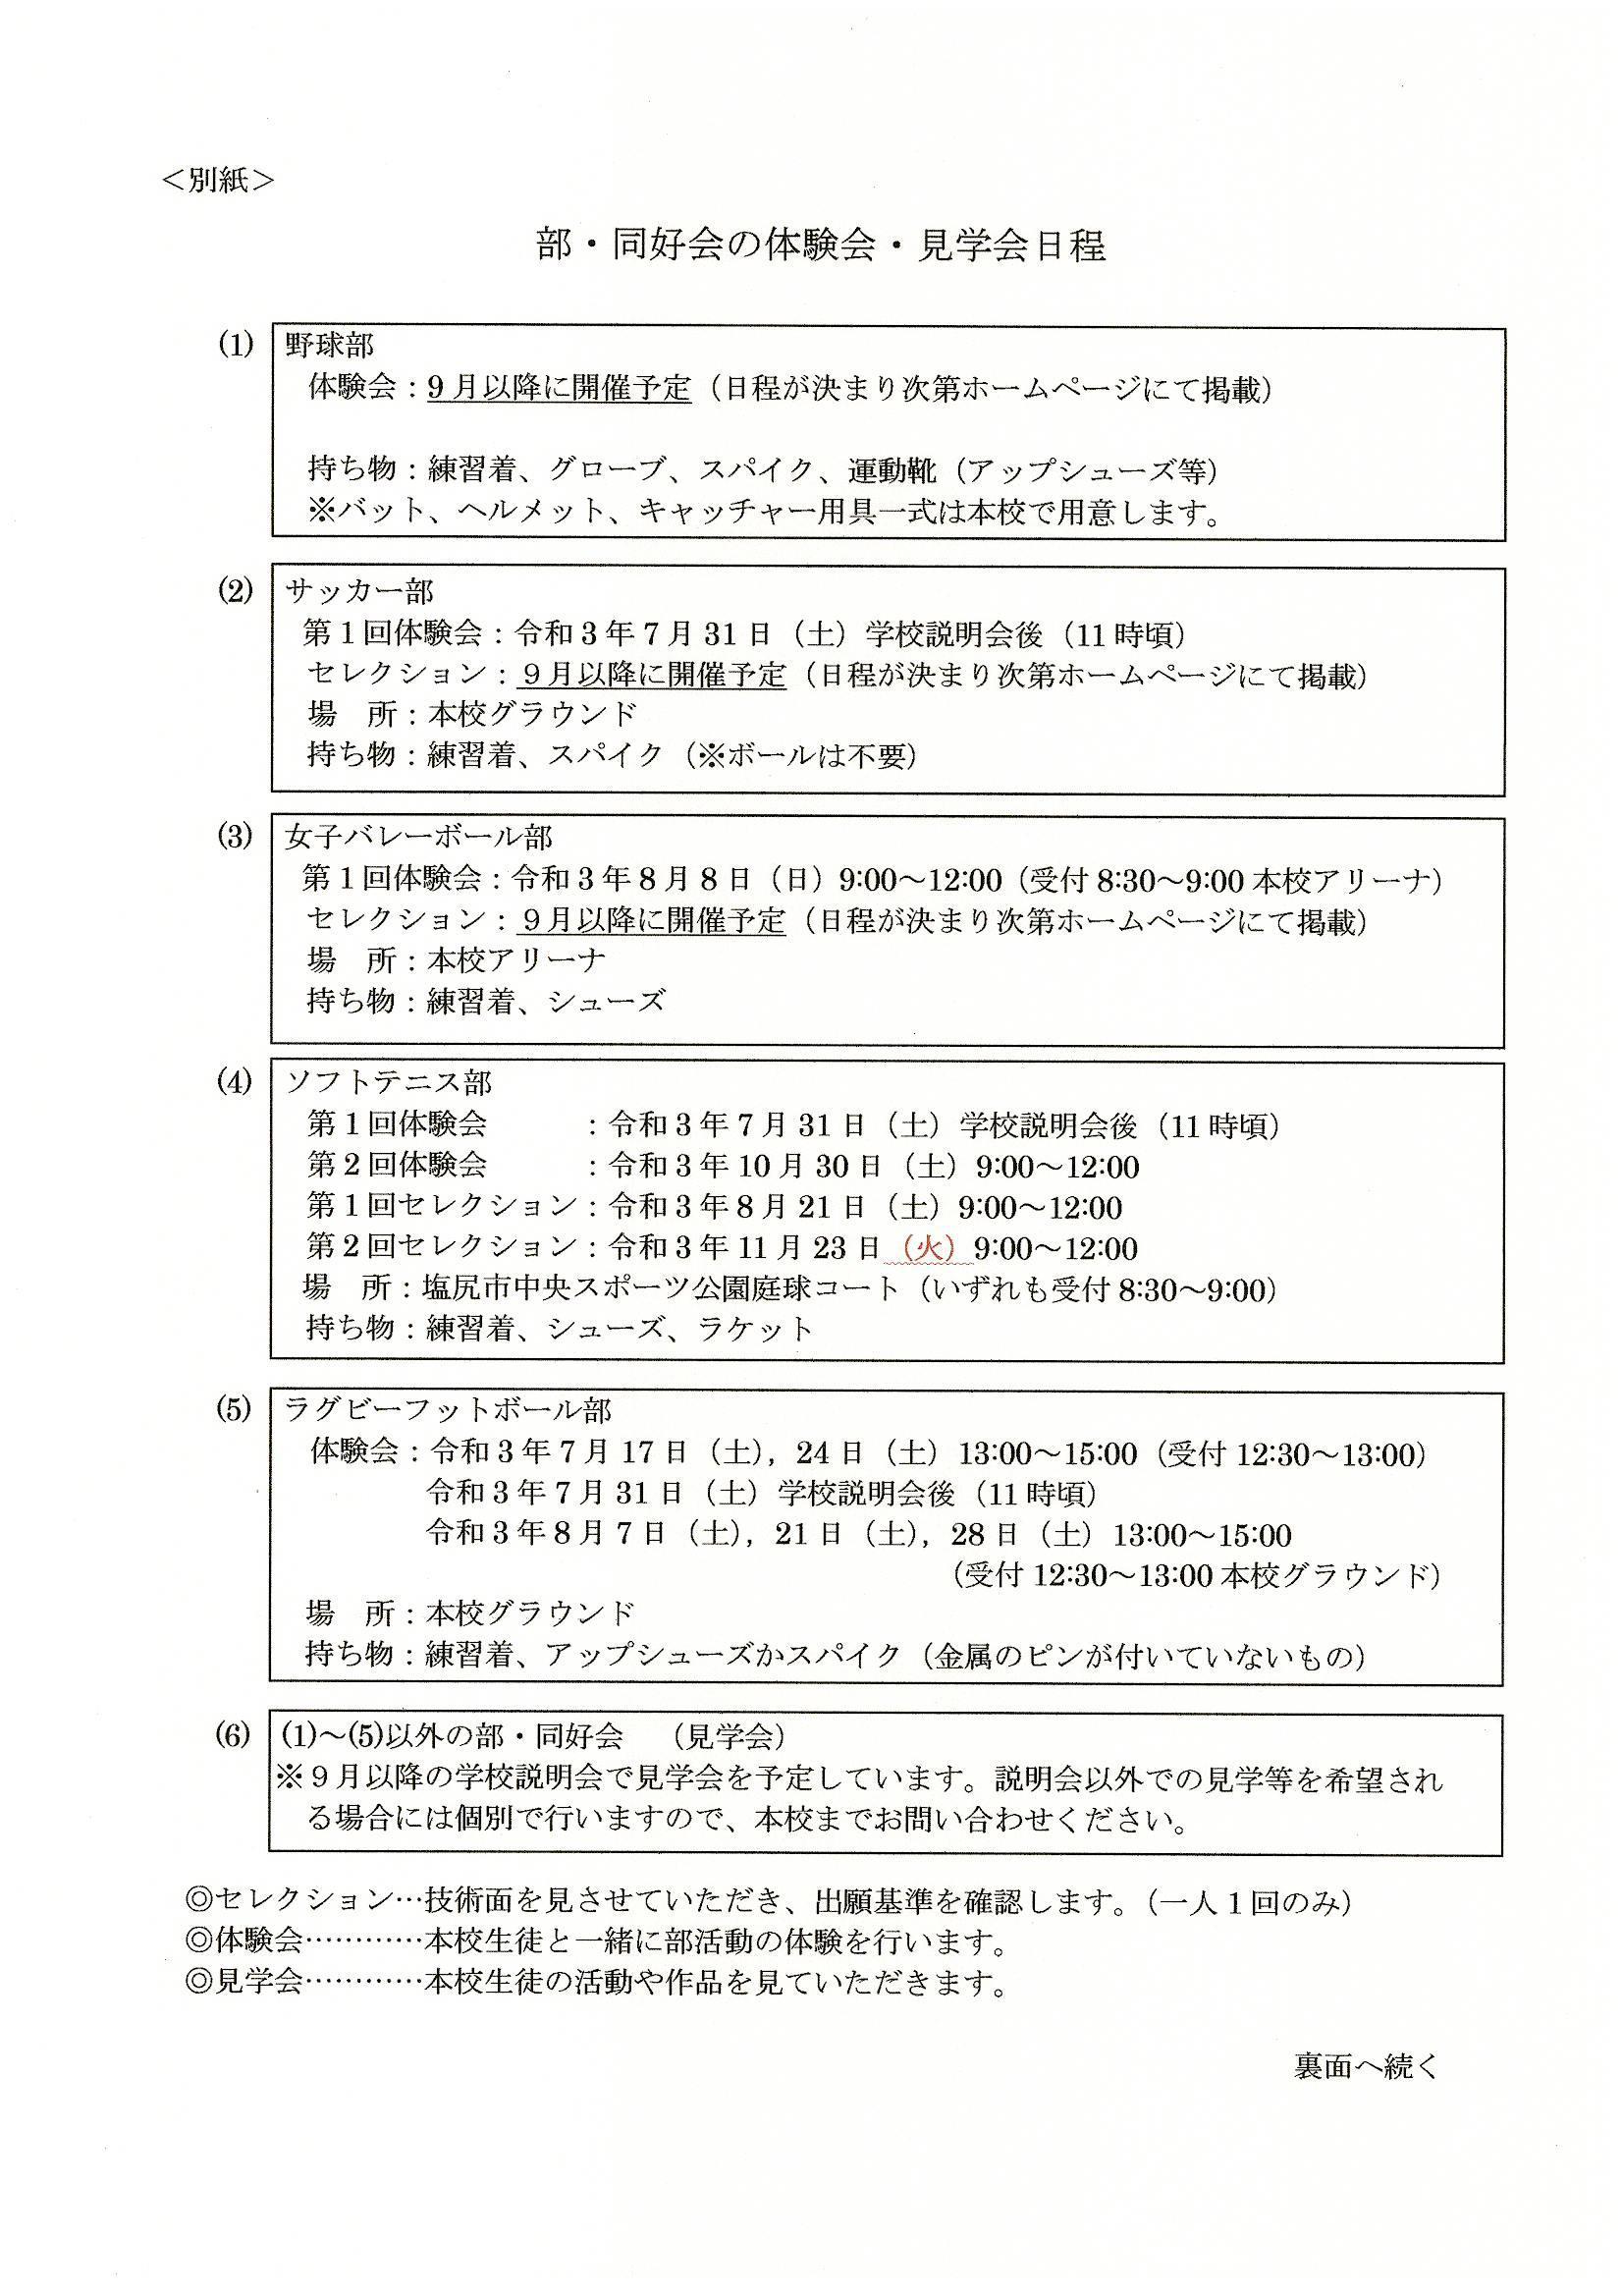 SCAN-0516.jpg